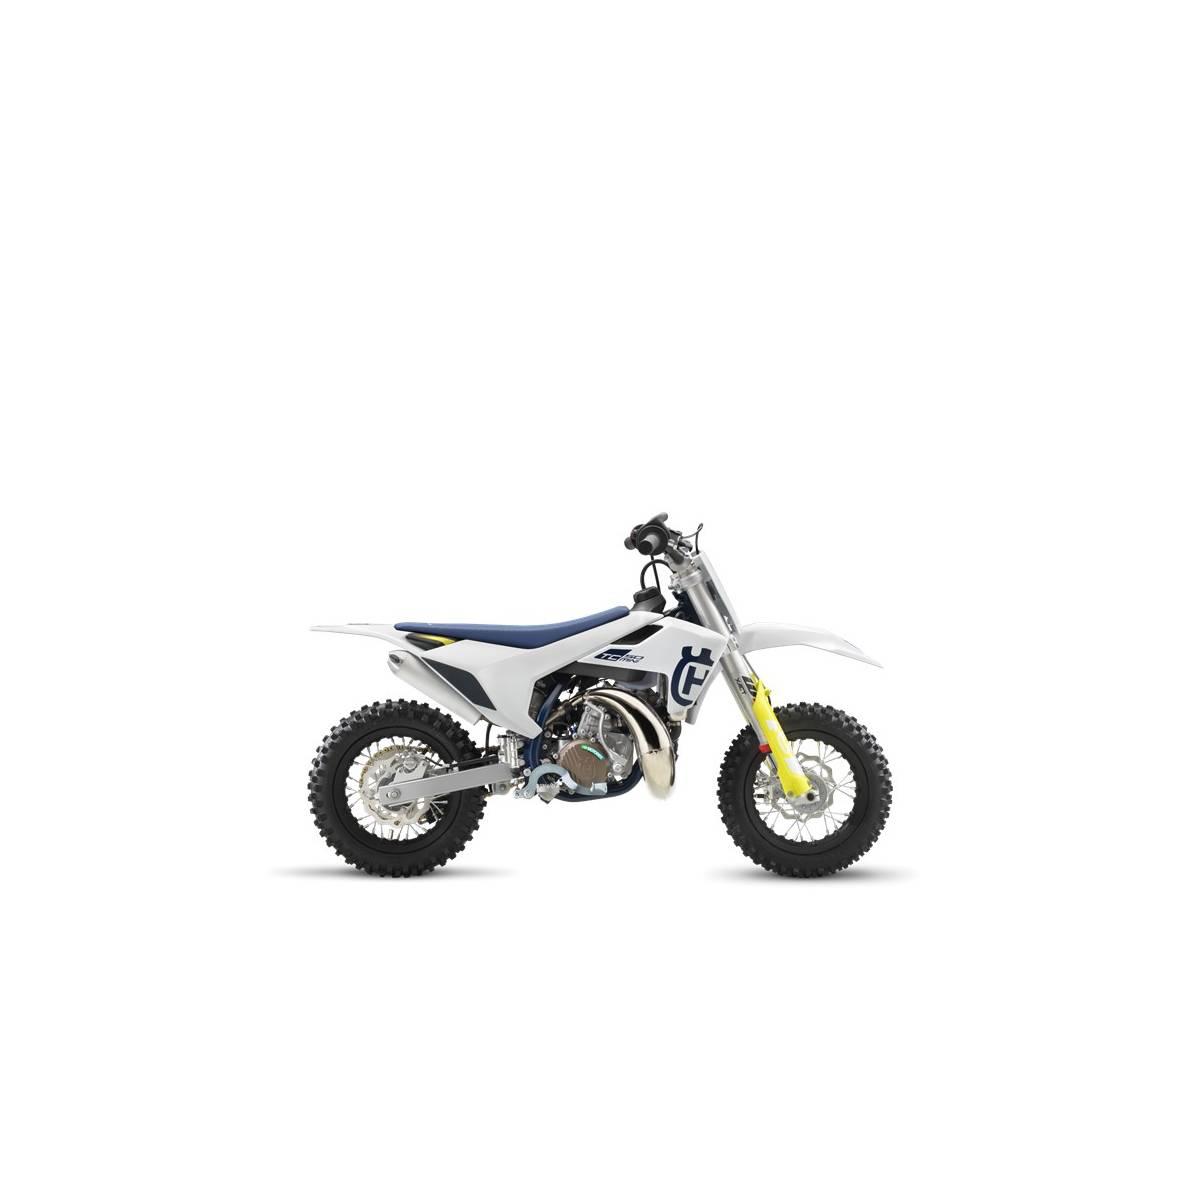 hsqv009 - Husqvarna Tc 50 Mini 2020